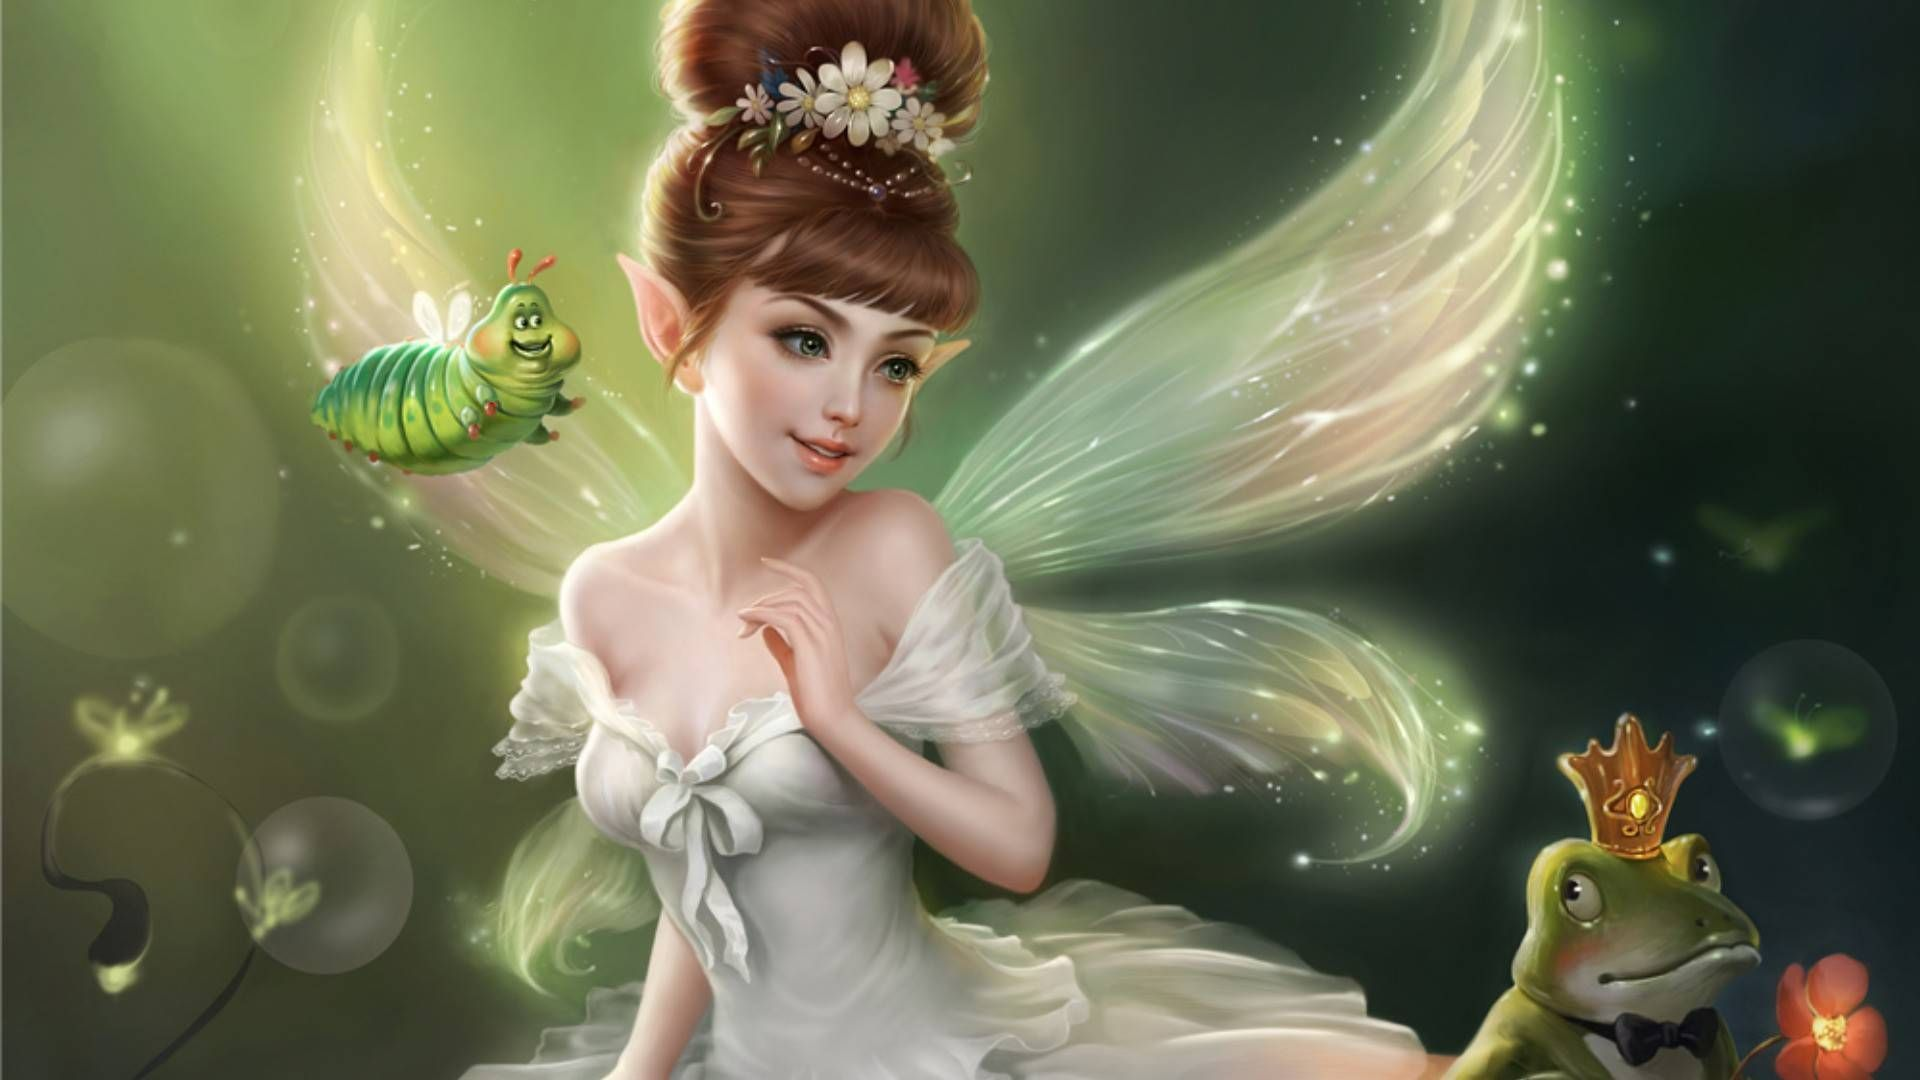 Fairies Fairies Fantasy 1920 1080 Wallpaper 2405072 Fairy Wallpaper Fairy Background Fairy Images